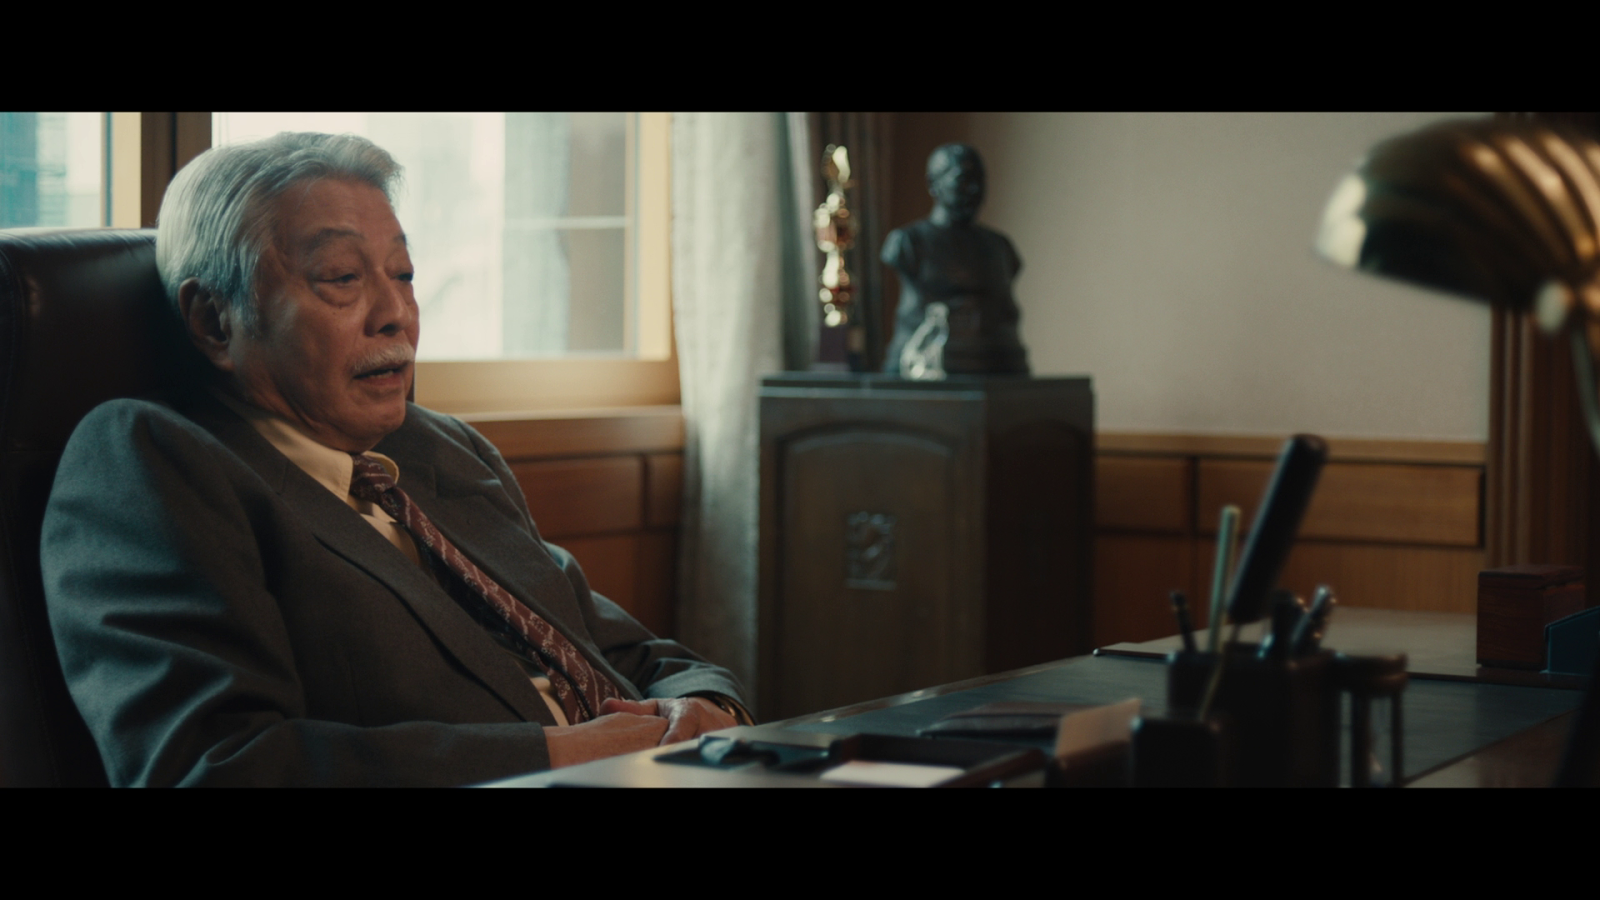 Kumiko The Treasure Hunter (2014) 1080p BD25 4